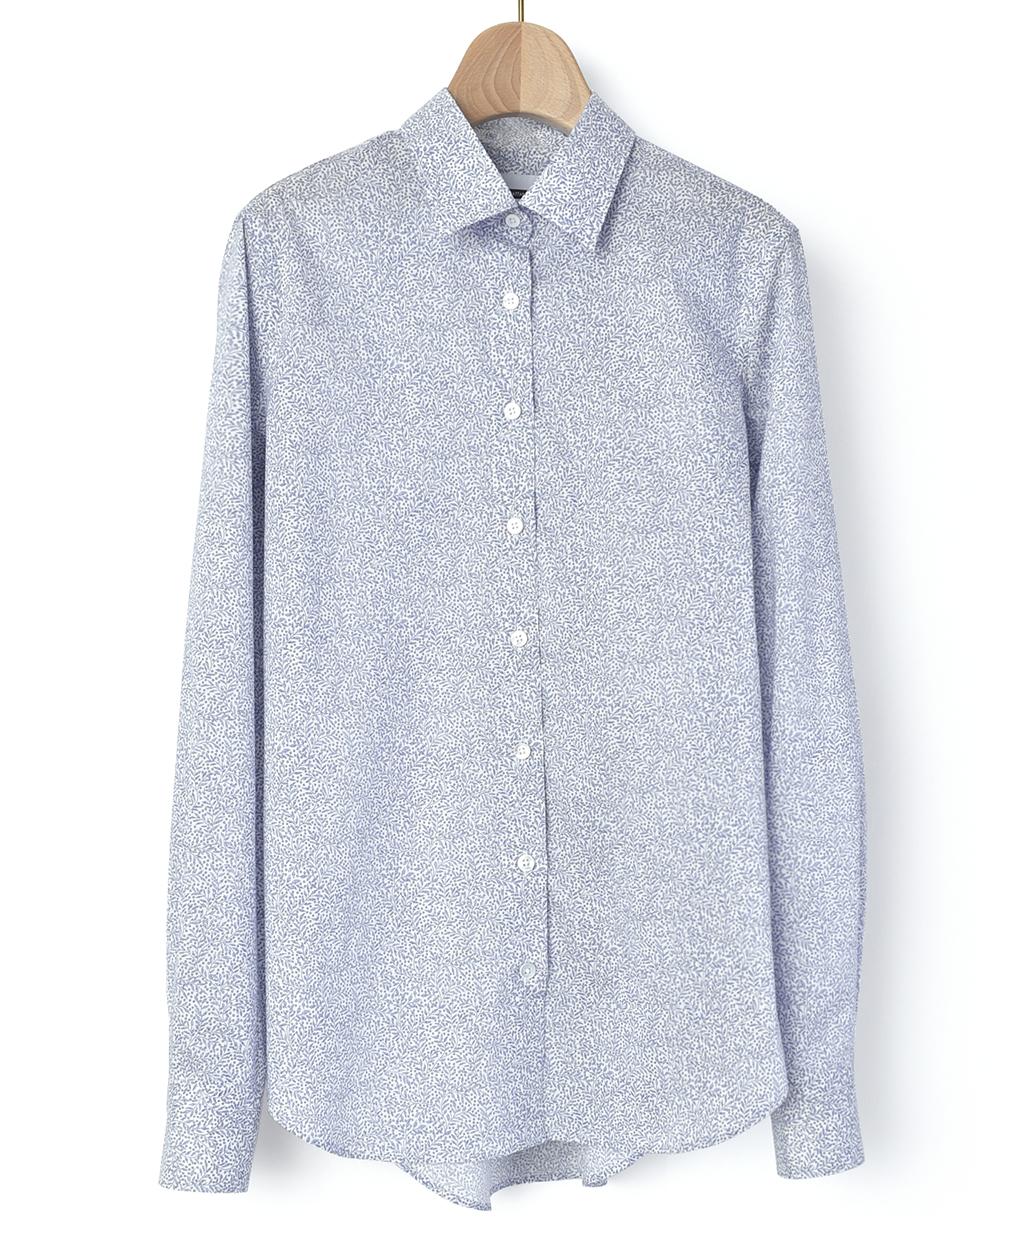 626cbfd0374252 マンハッタンスリムシャツ(40サイズ / 11号 ブルー系): レディース ...